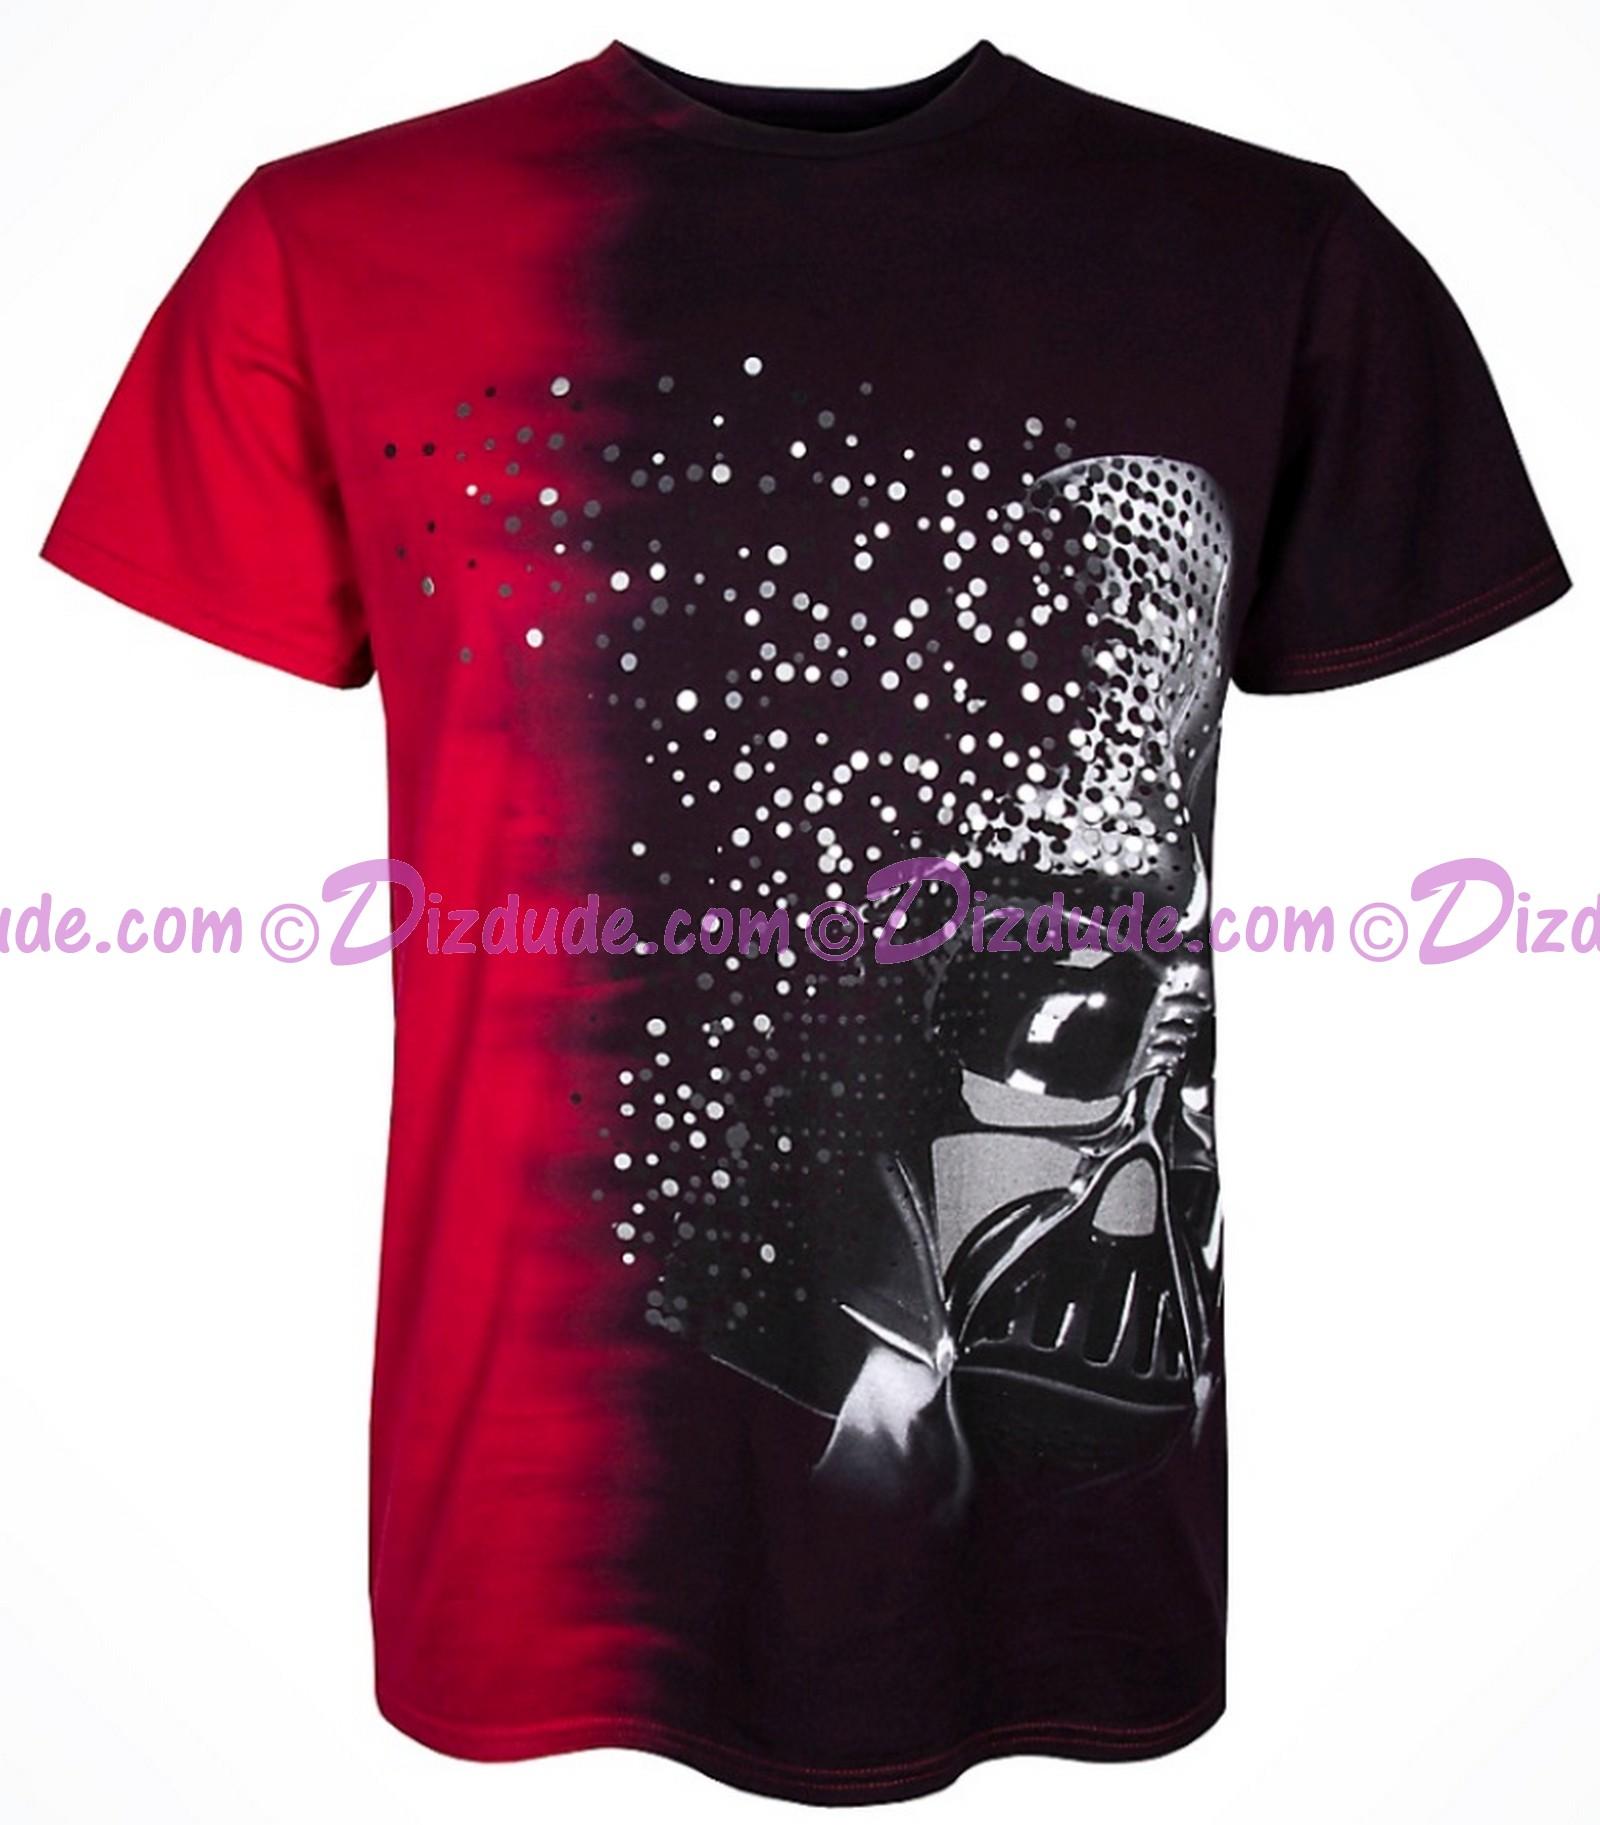 Darth Vader Particles Adult T-Shirt (Tshirt, T shirt or Tee) - Disney Star Wars Episode VIII: The Last Jedi  © Dizdude.com